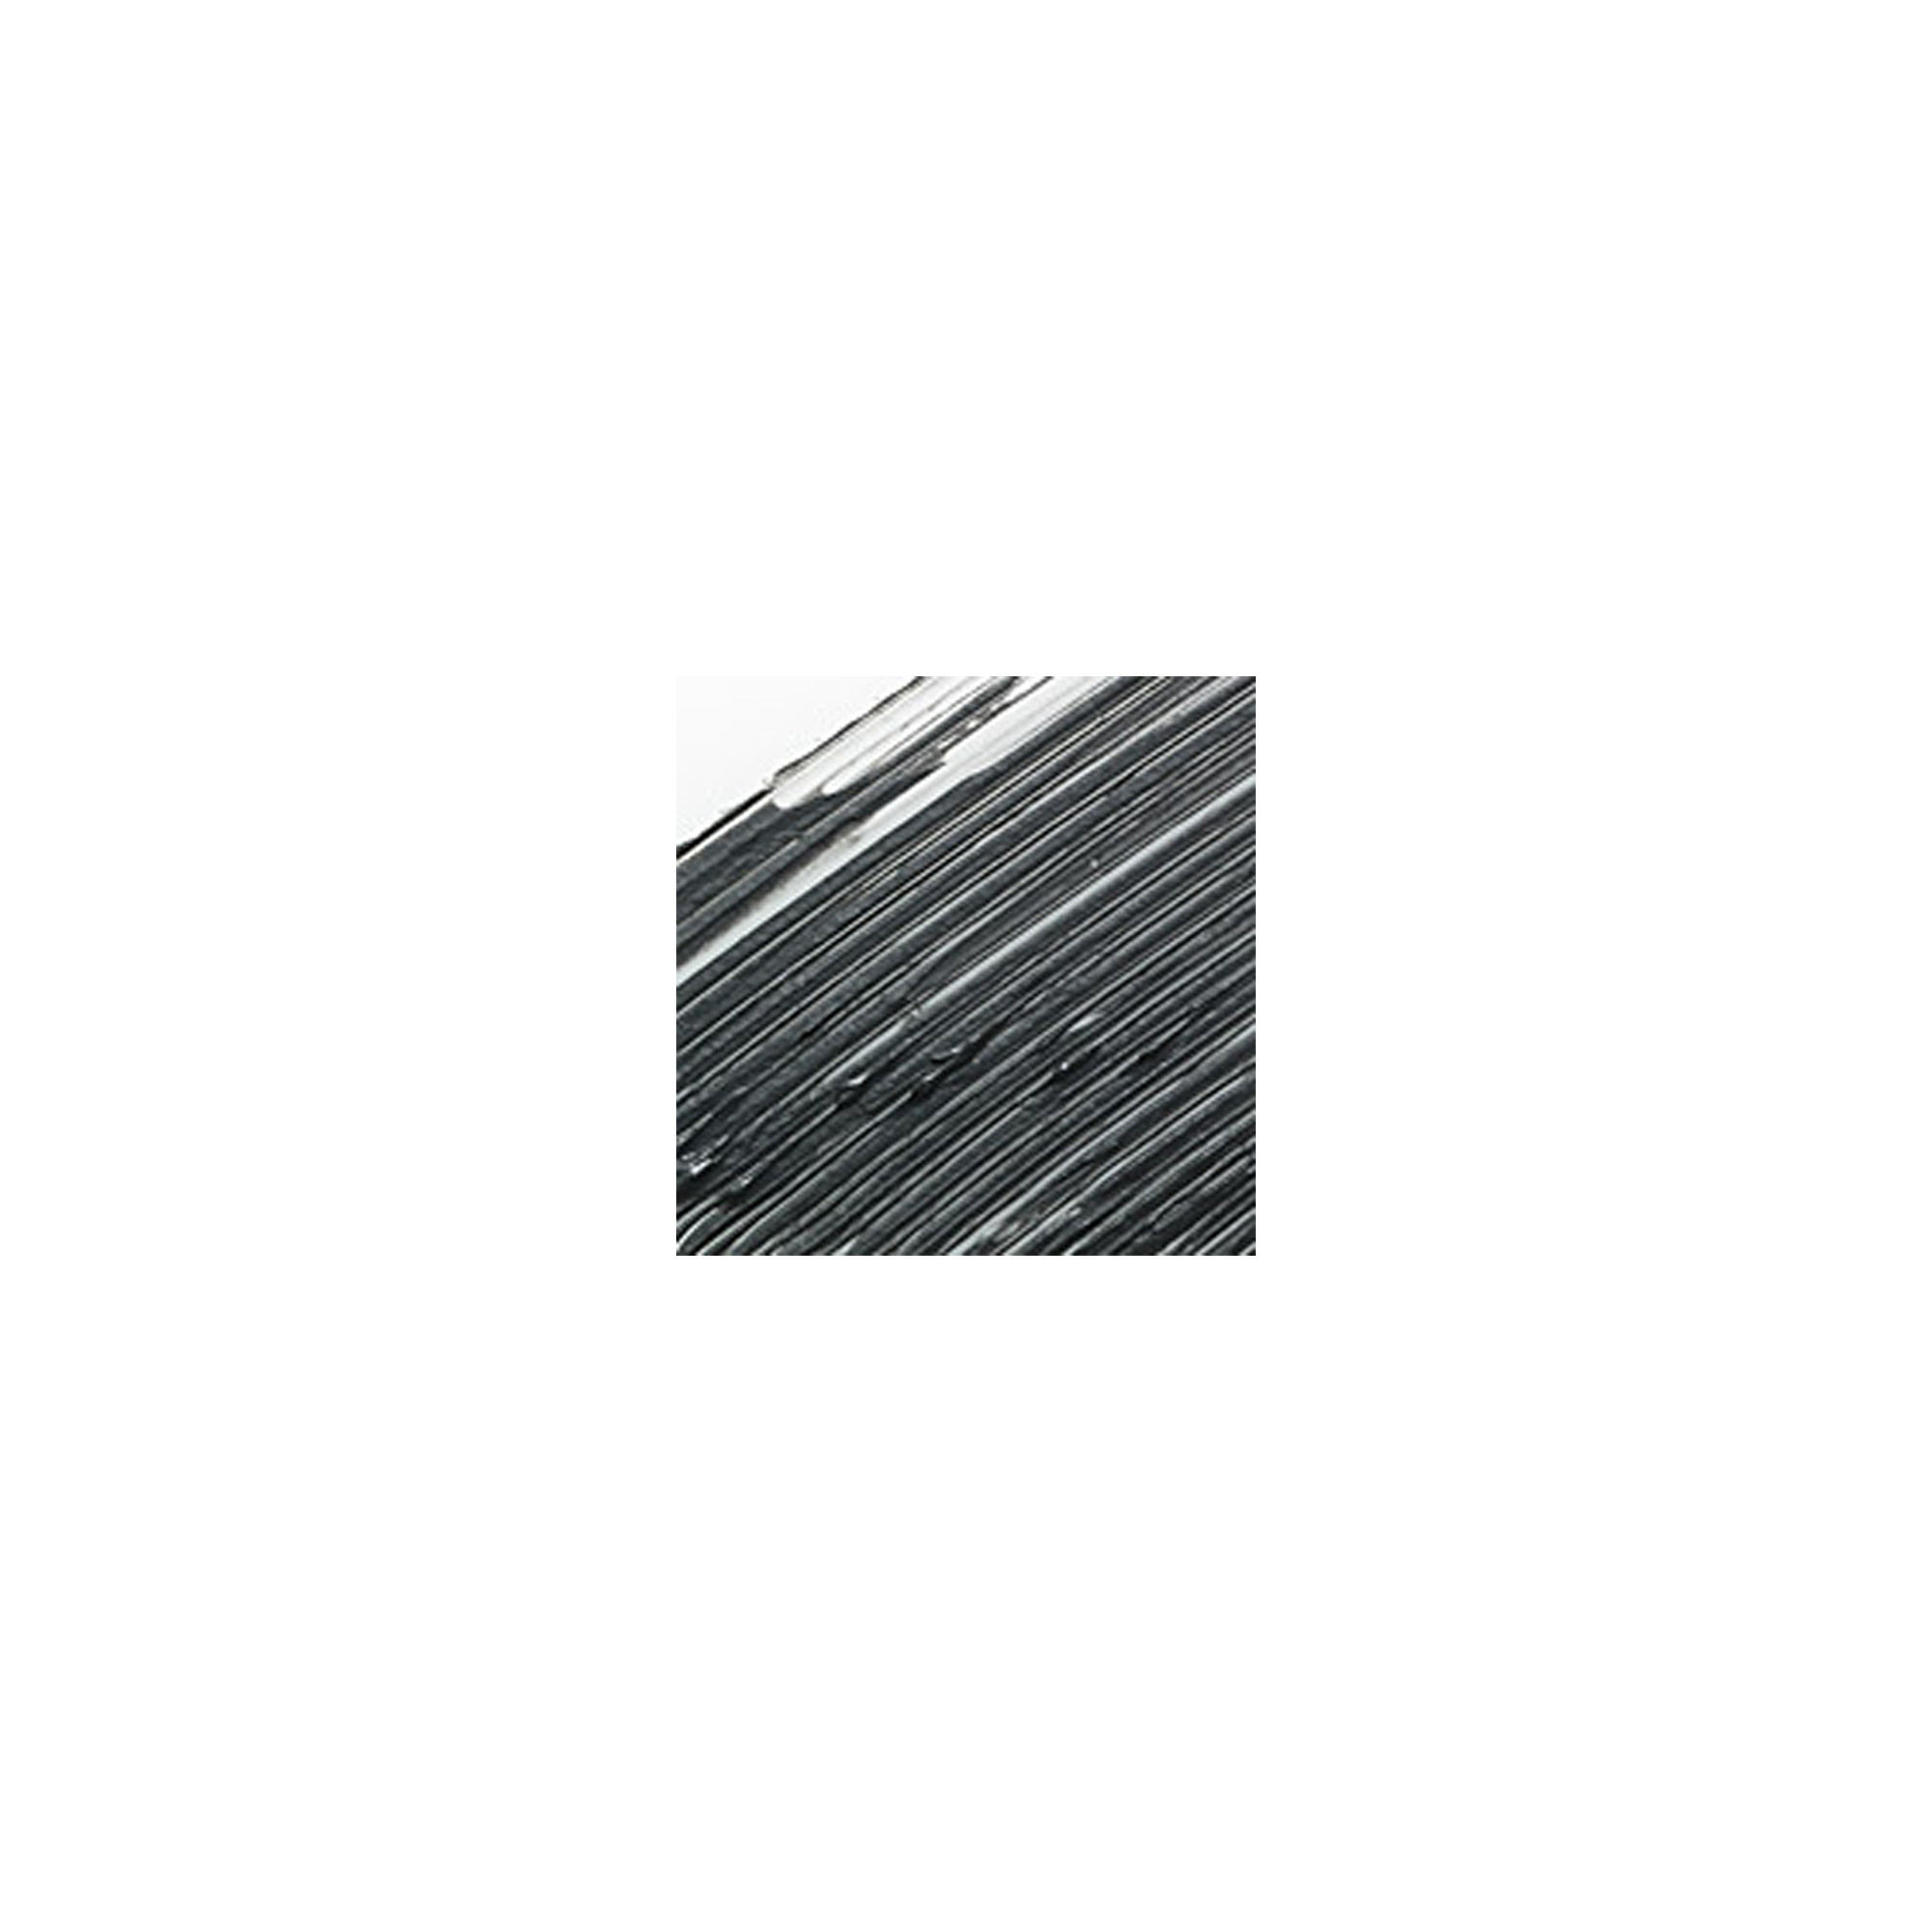 In Extreme Dimension Wp Mascara - Dimensional Black, WATERPROOF DIMENSIONAL BLACK, large image number 1